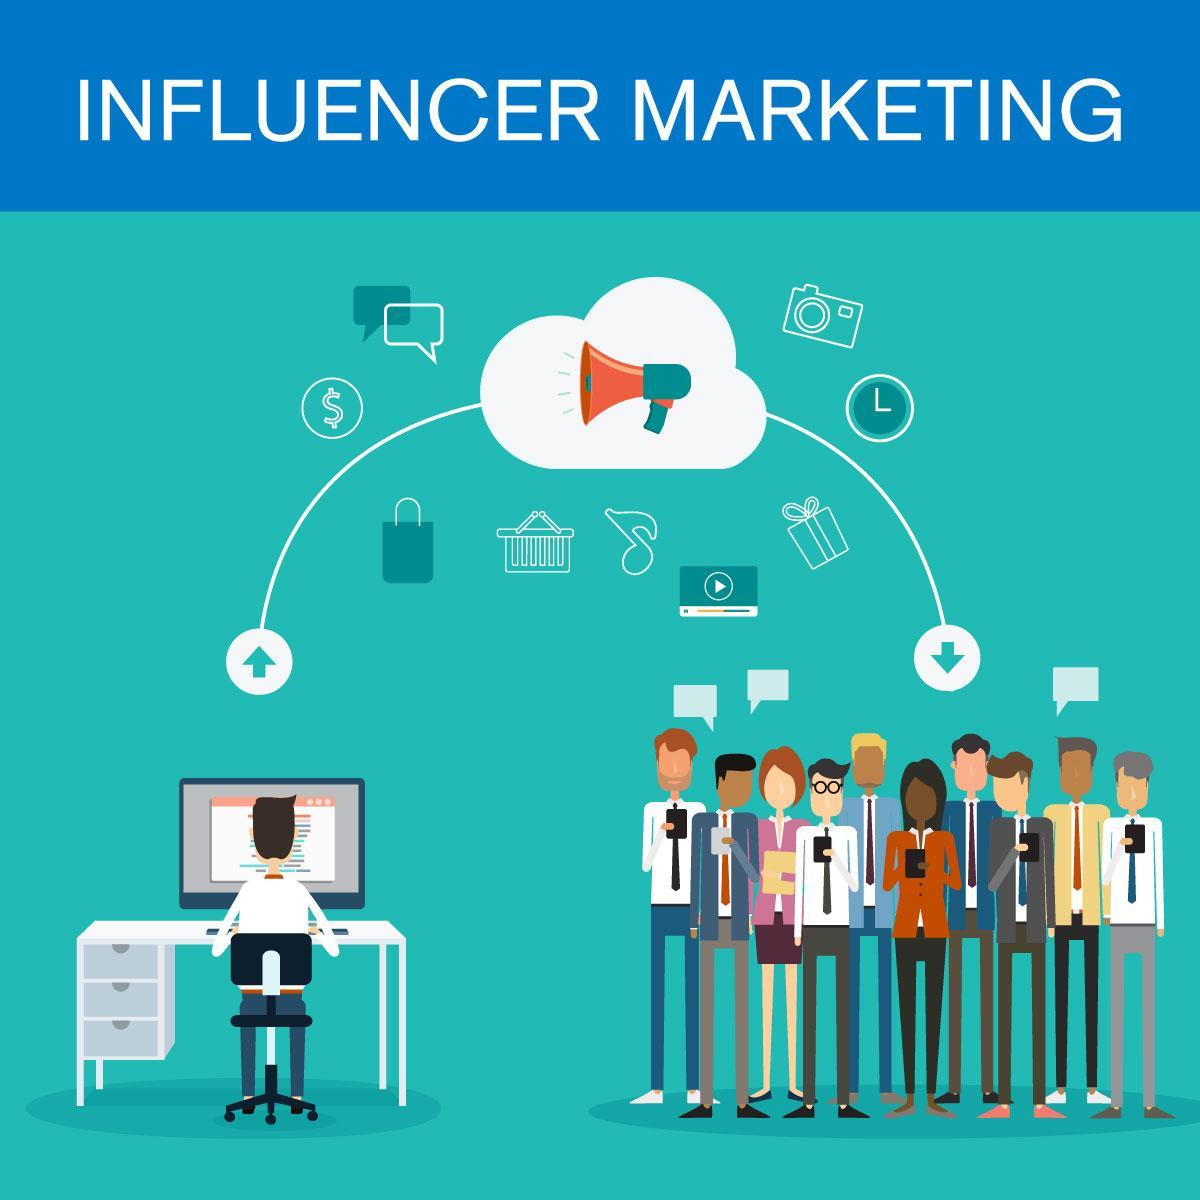 C:\Users\lenovo\Downloads\BDC_Blog_InfluencerMarketing-1200x1200-1.jpg